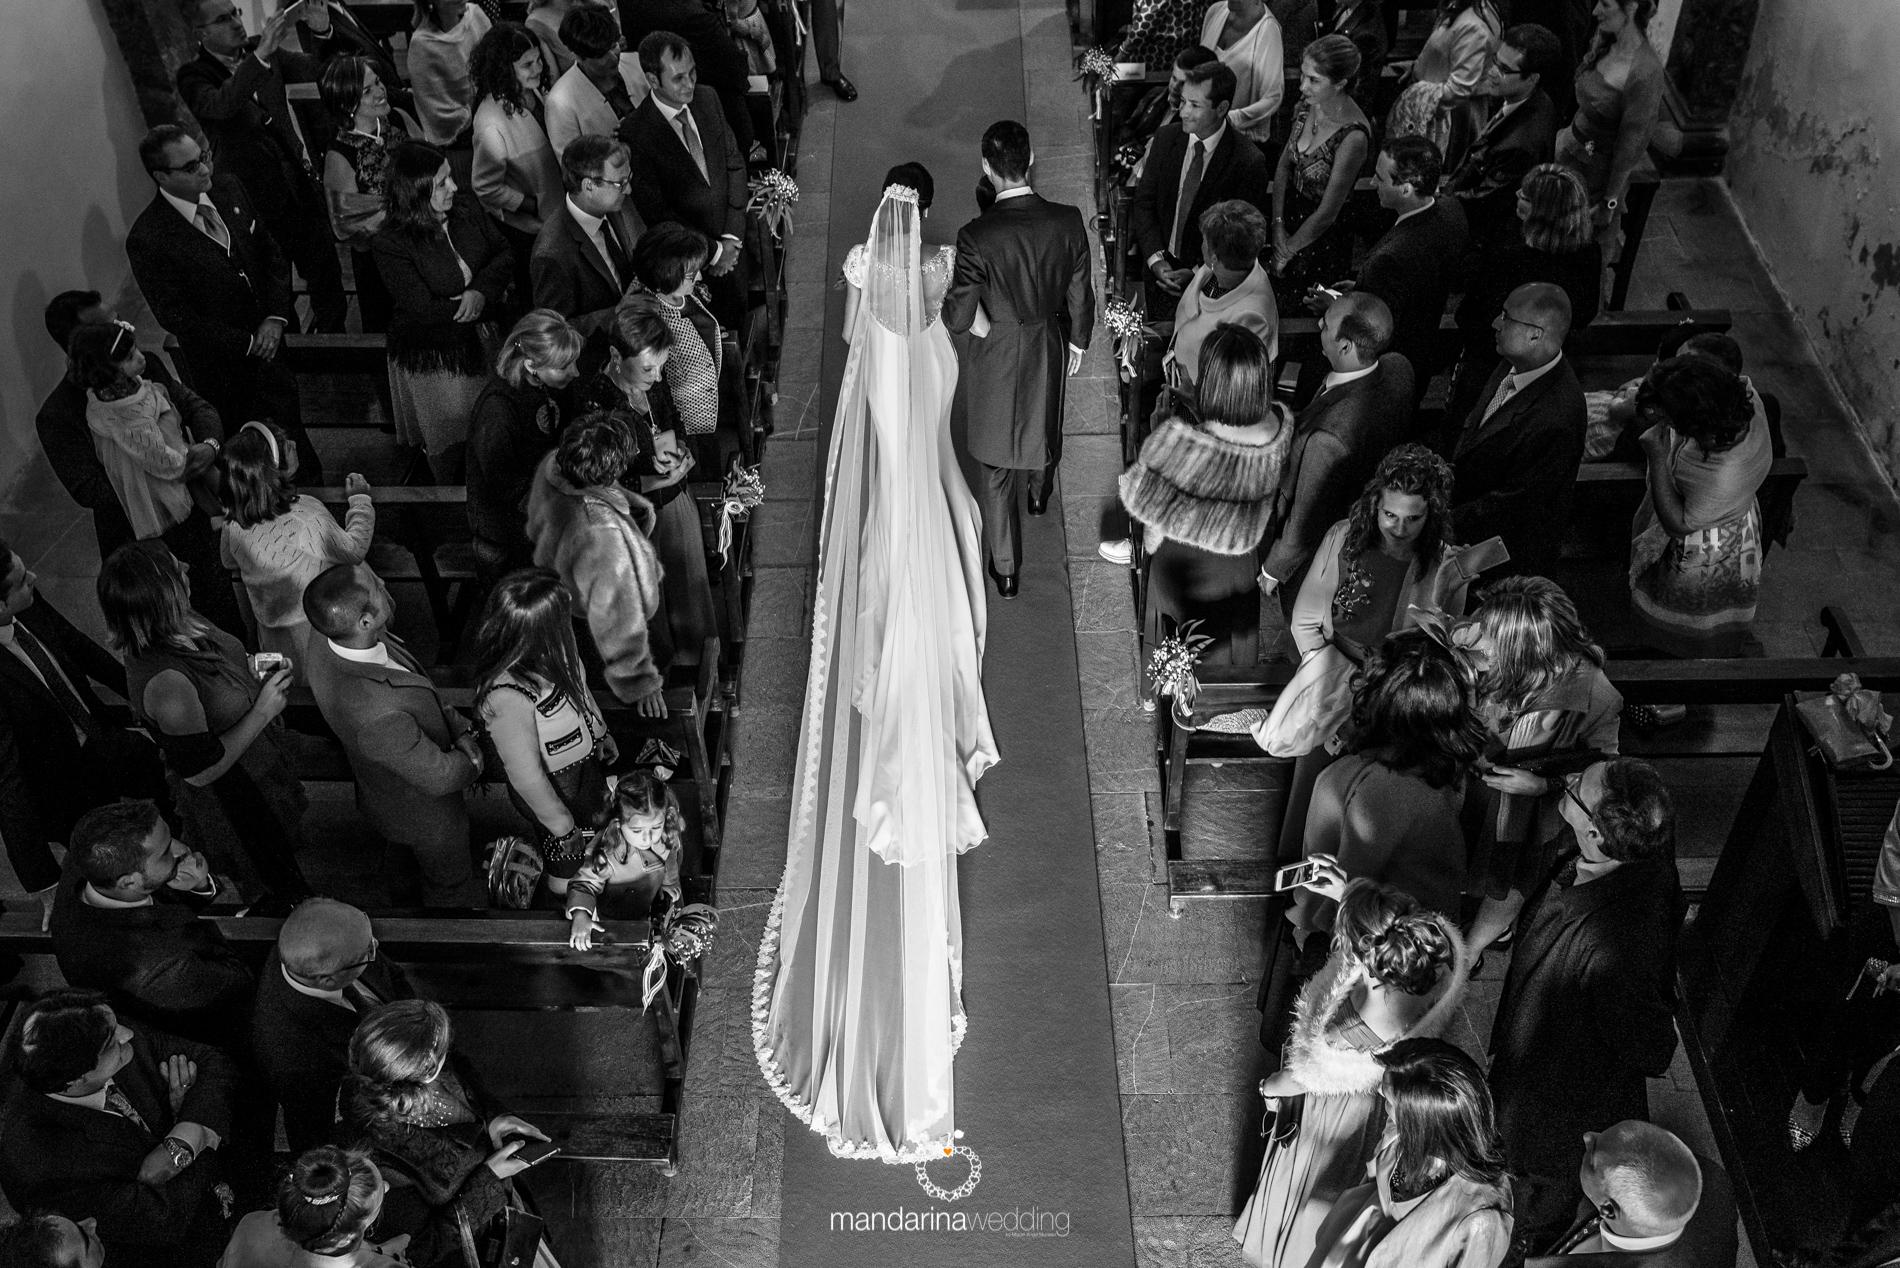 mandaria wedding, fotografos de boda, fotoperiodismo de boda, mejores fotografos de boda, bodas soria, bodas pirineo, bodas Madrid, fotógrafos tarragona_30